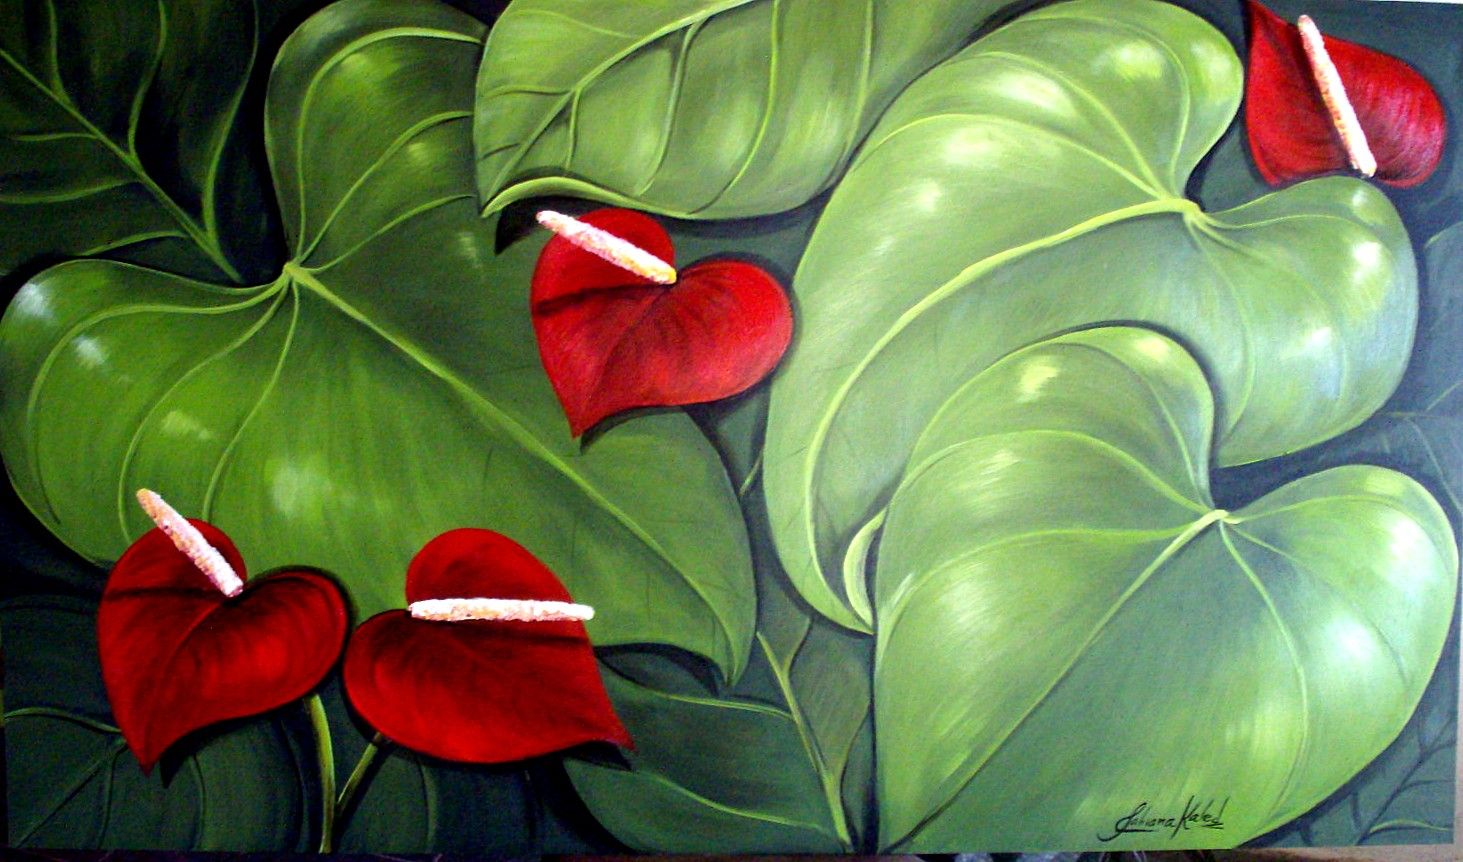 Pintura em madeira mariposas pinterest flowers paintings and pintura em madeira mightylinksfo